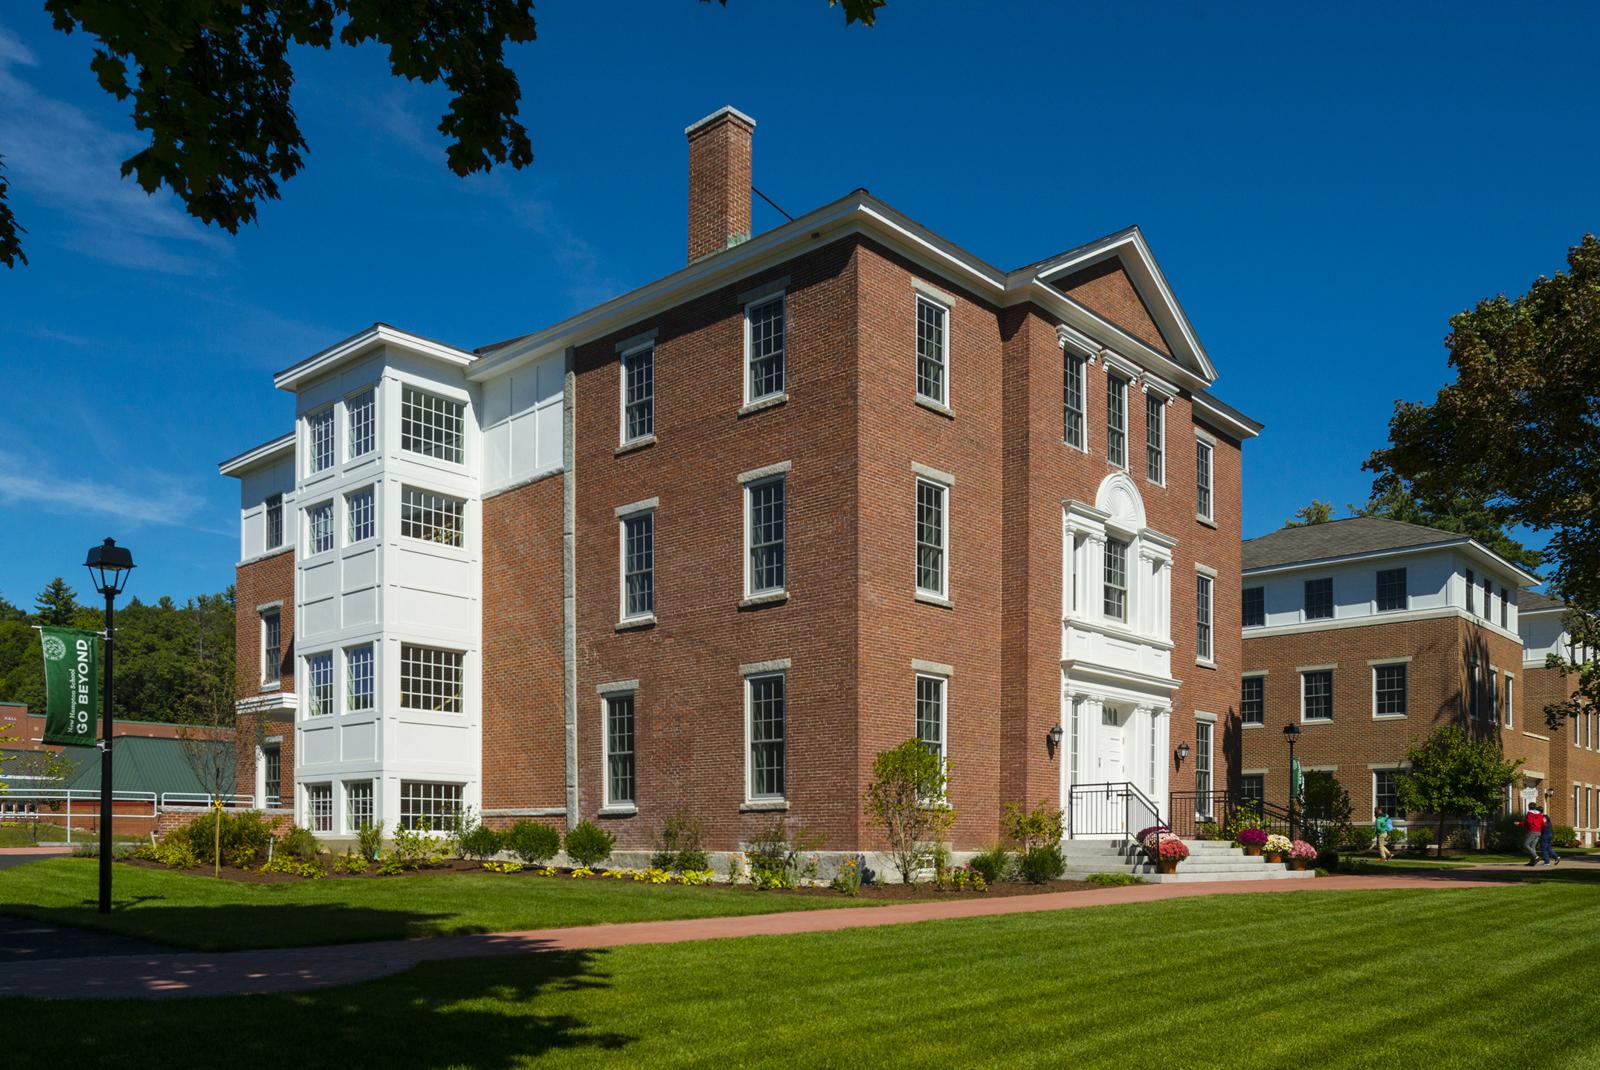 Meservey Hall  New Hampton School, New Hampton, NH